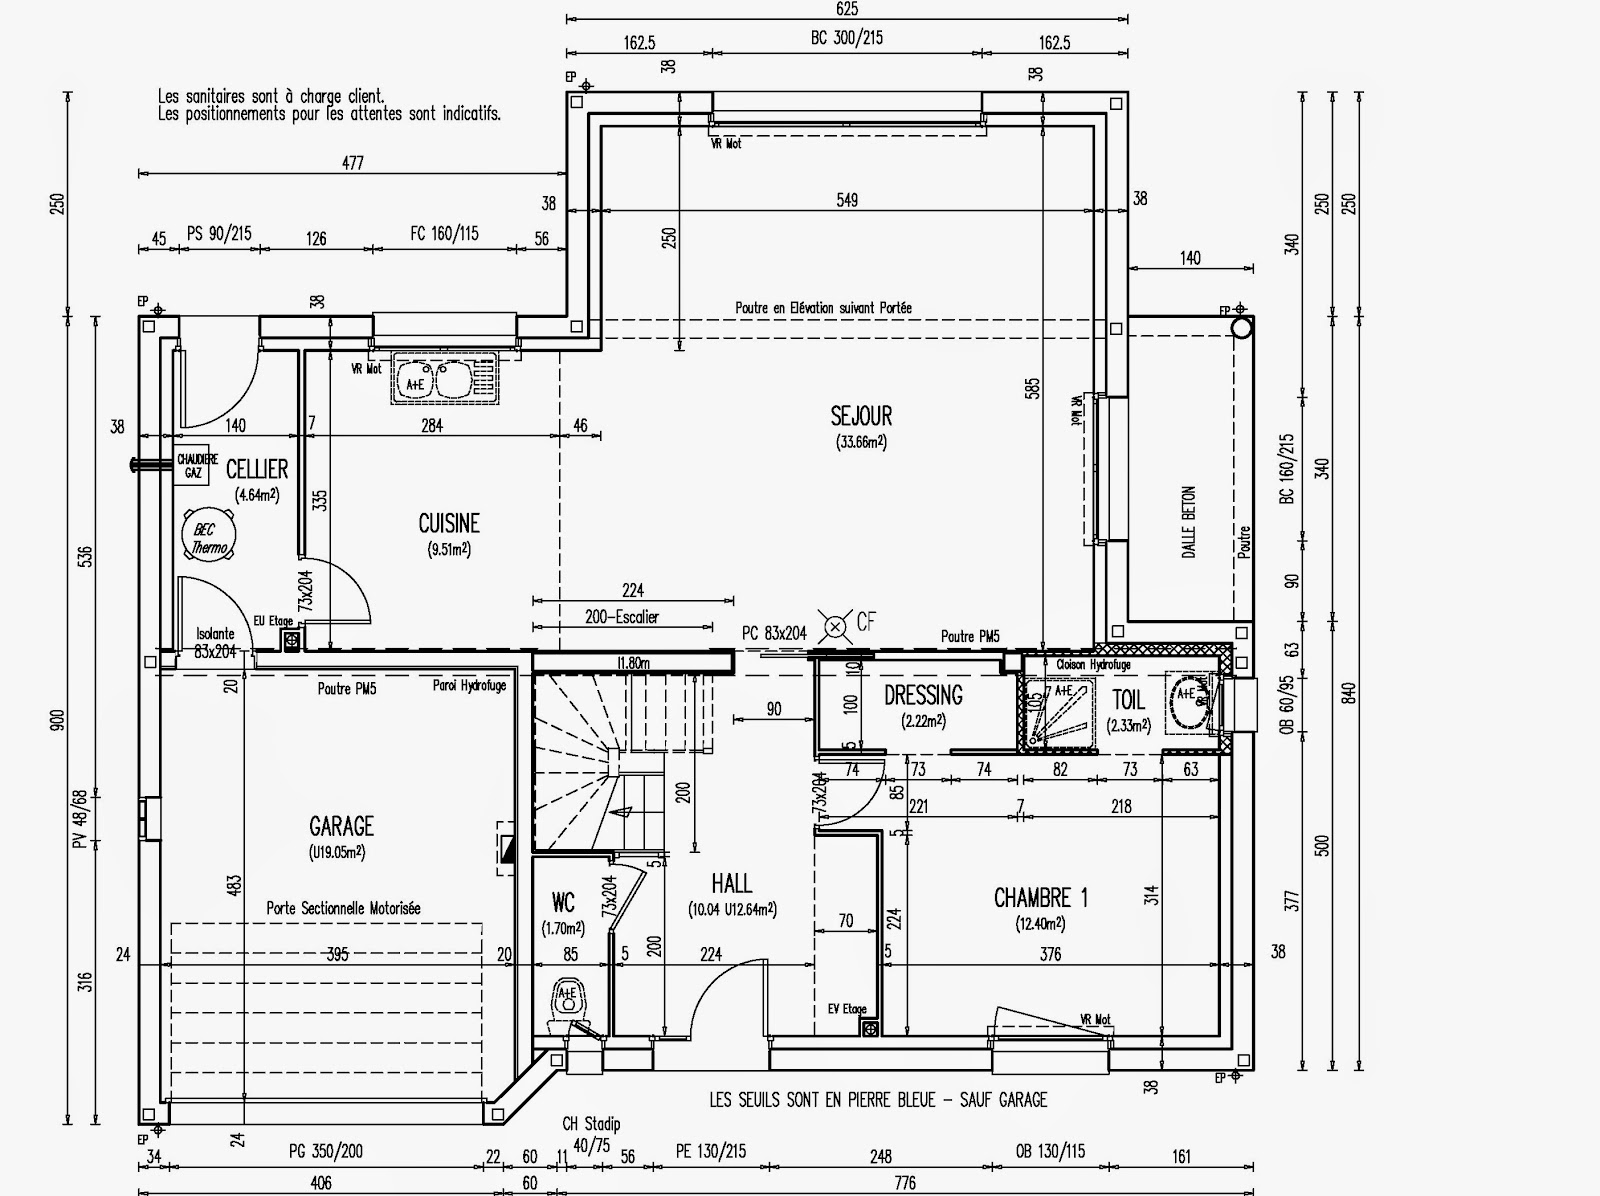 Plan maison 1 chambre rdc for Plan maison 1 chambre